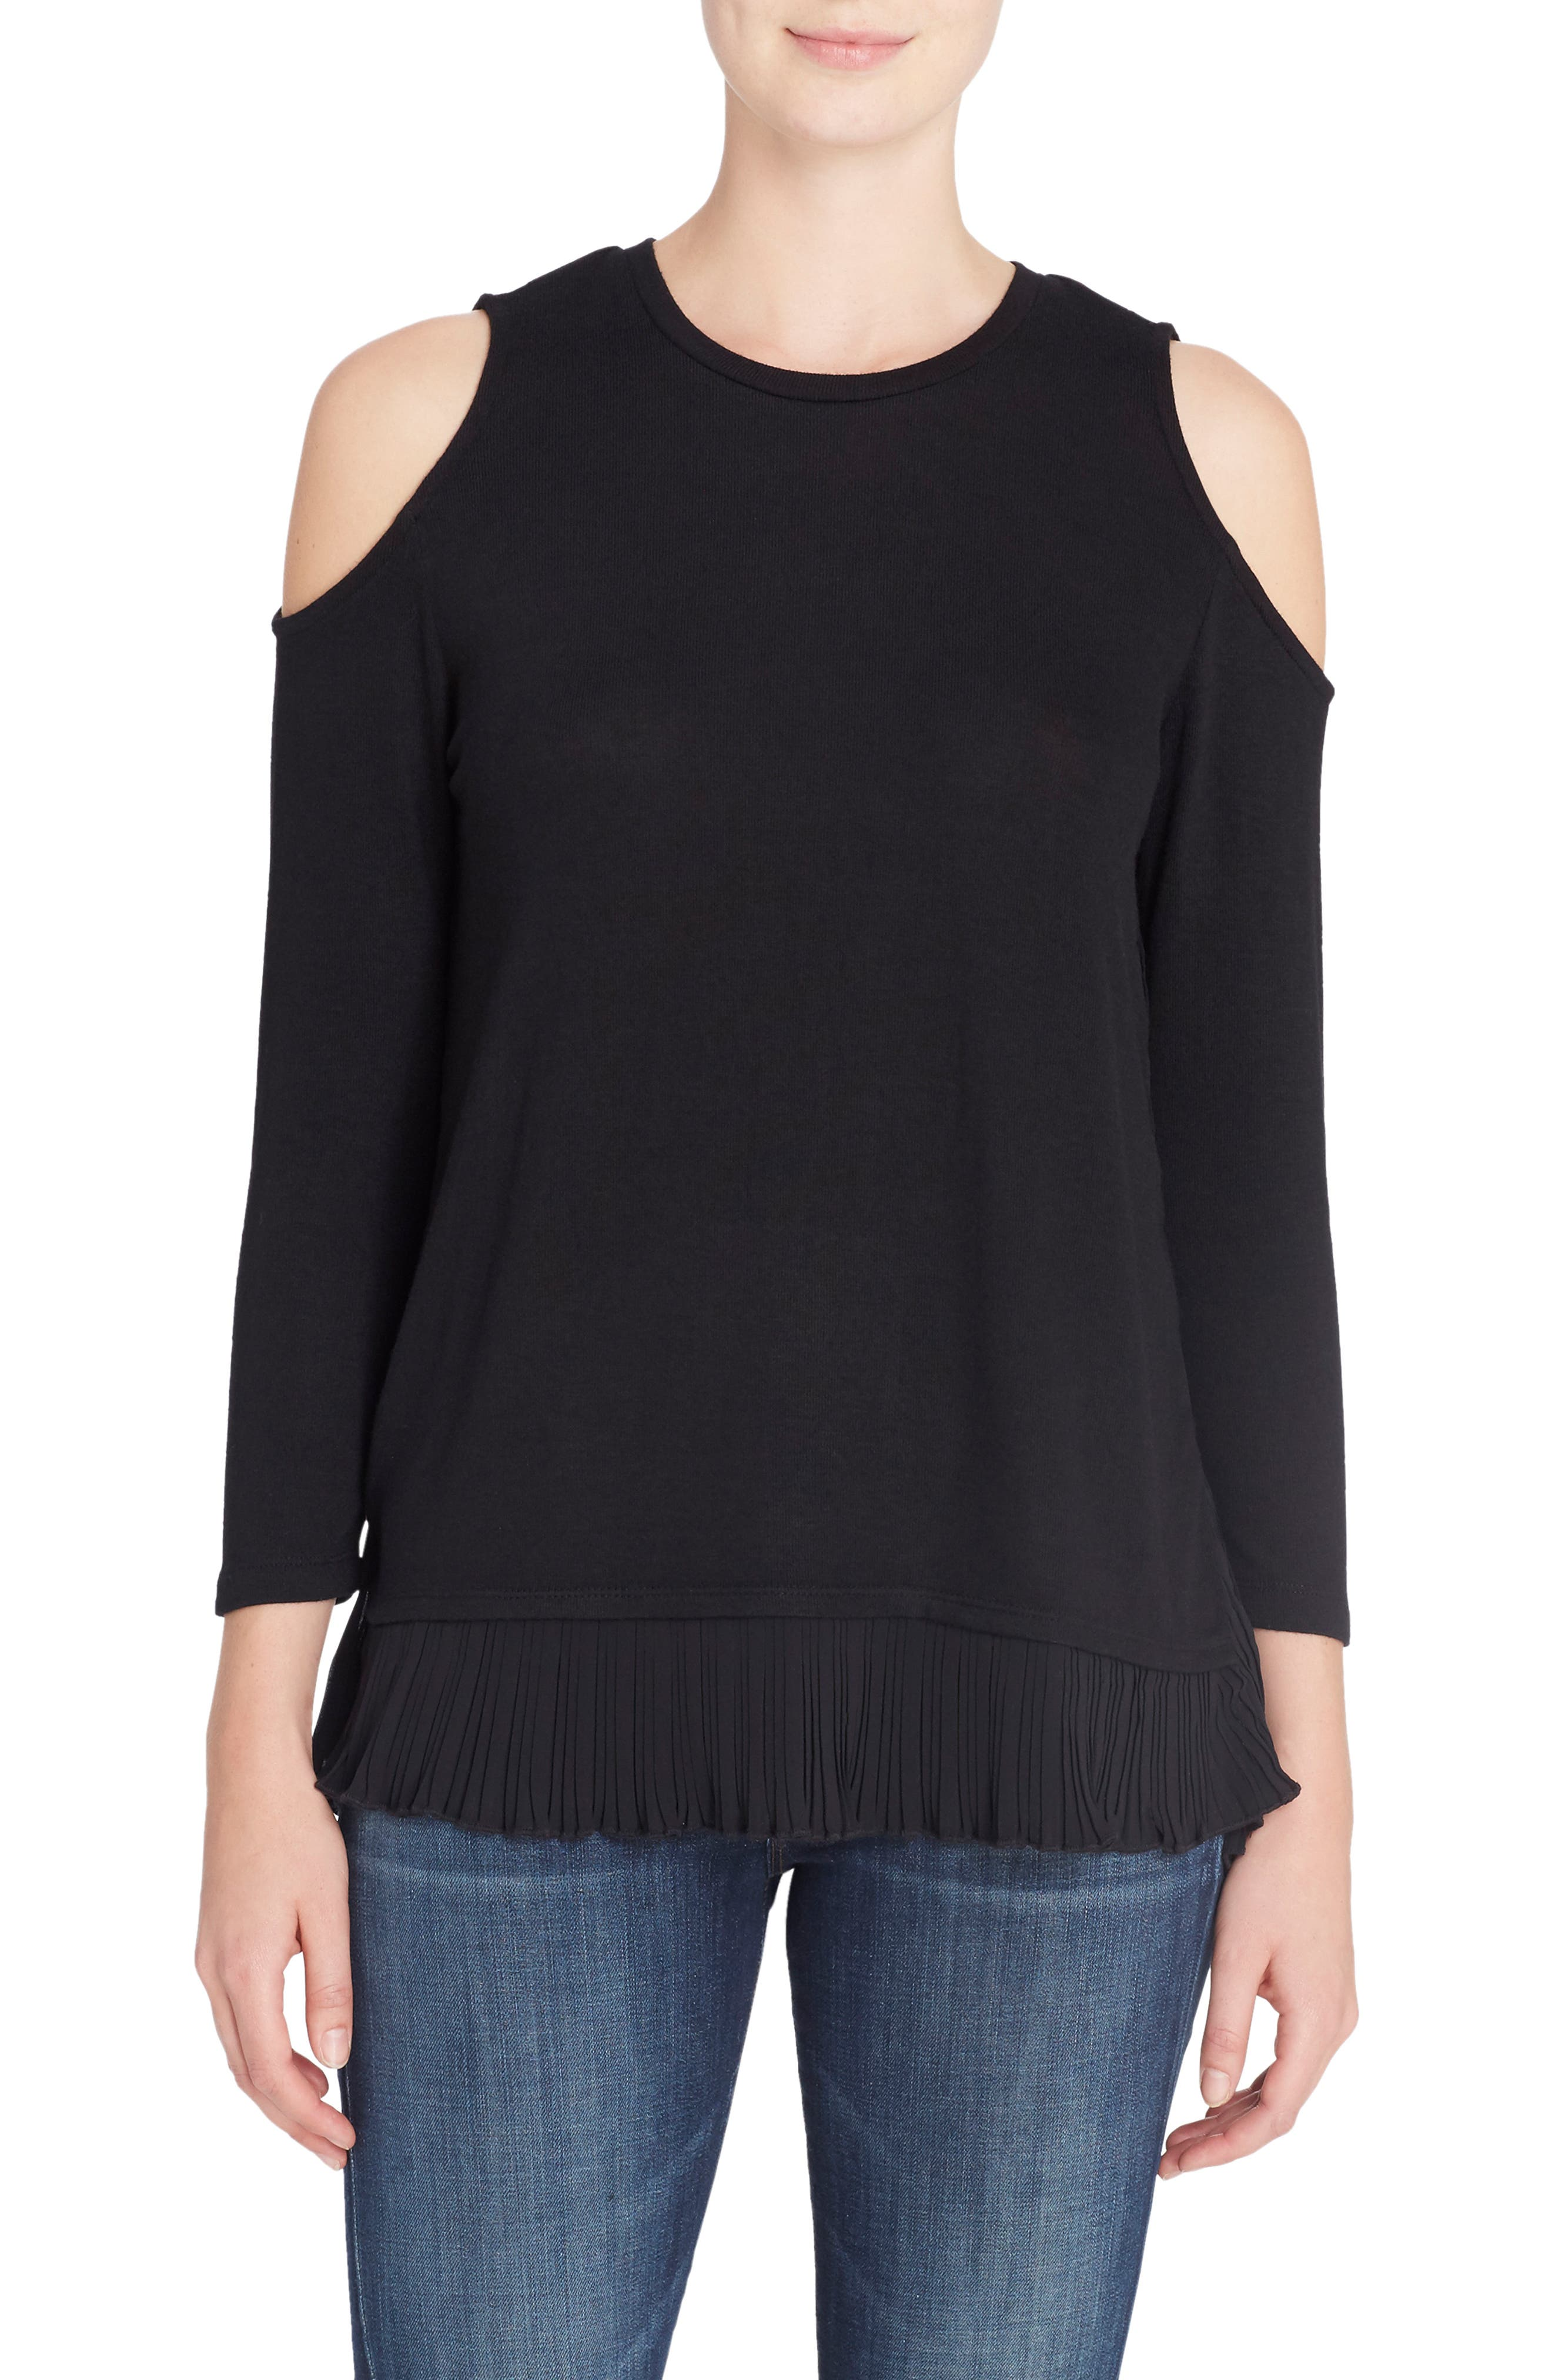 Linda Mixed Media Cold Shoulder Sweater,                         Main,                         color, Black Beauty